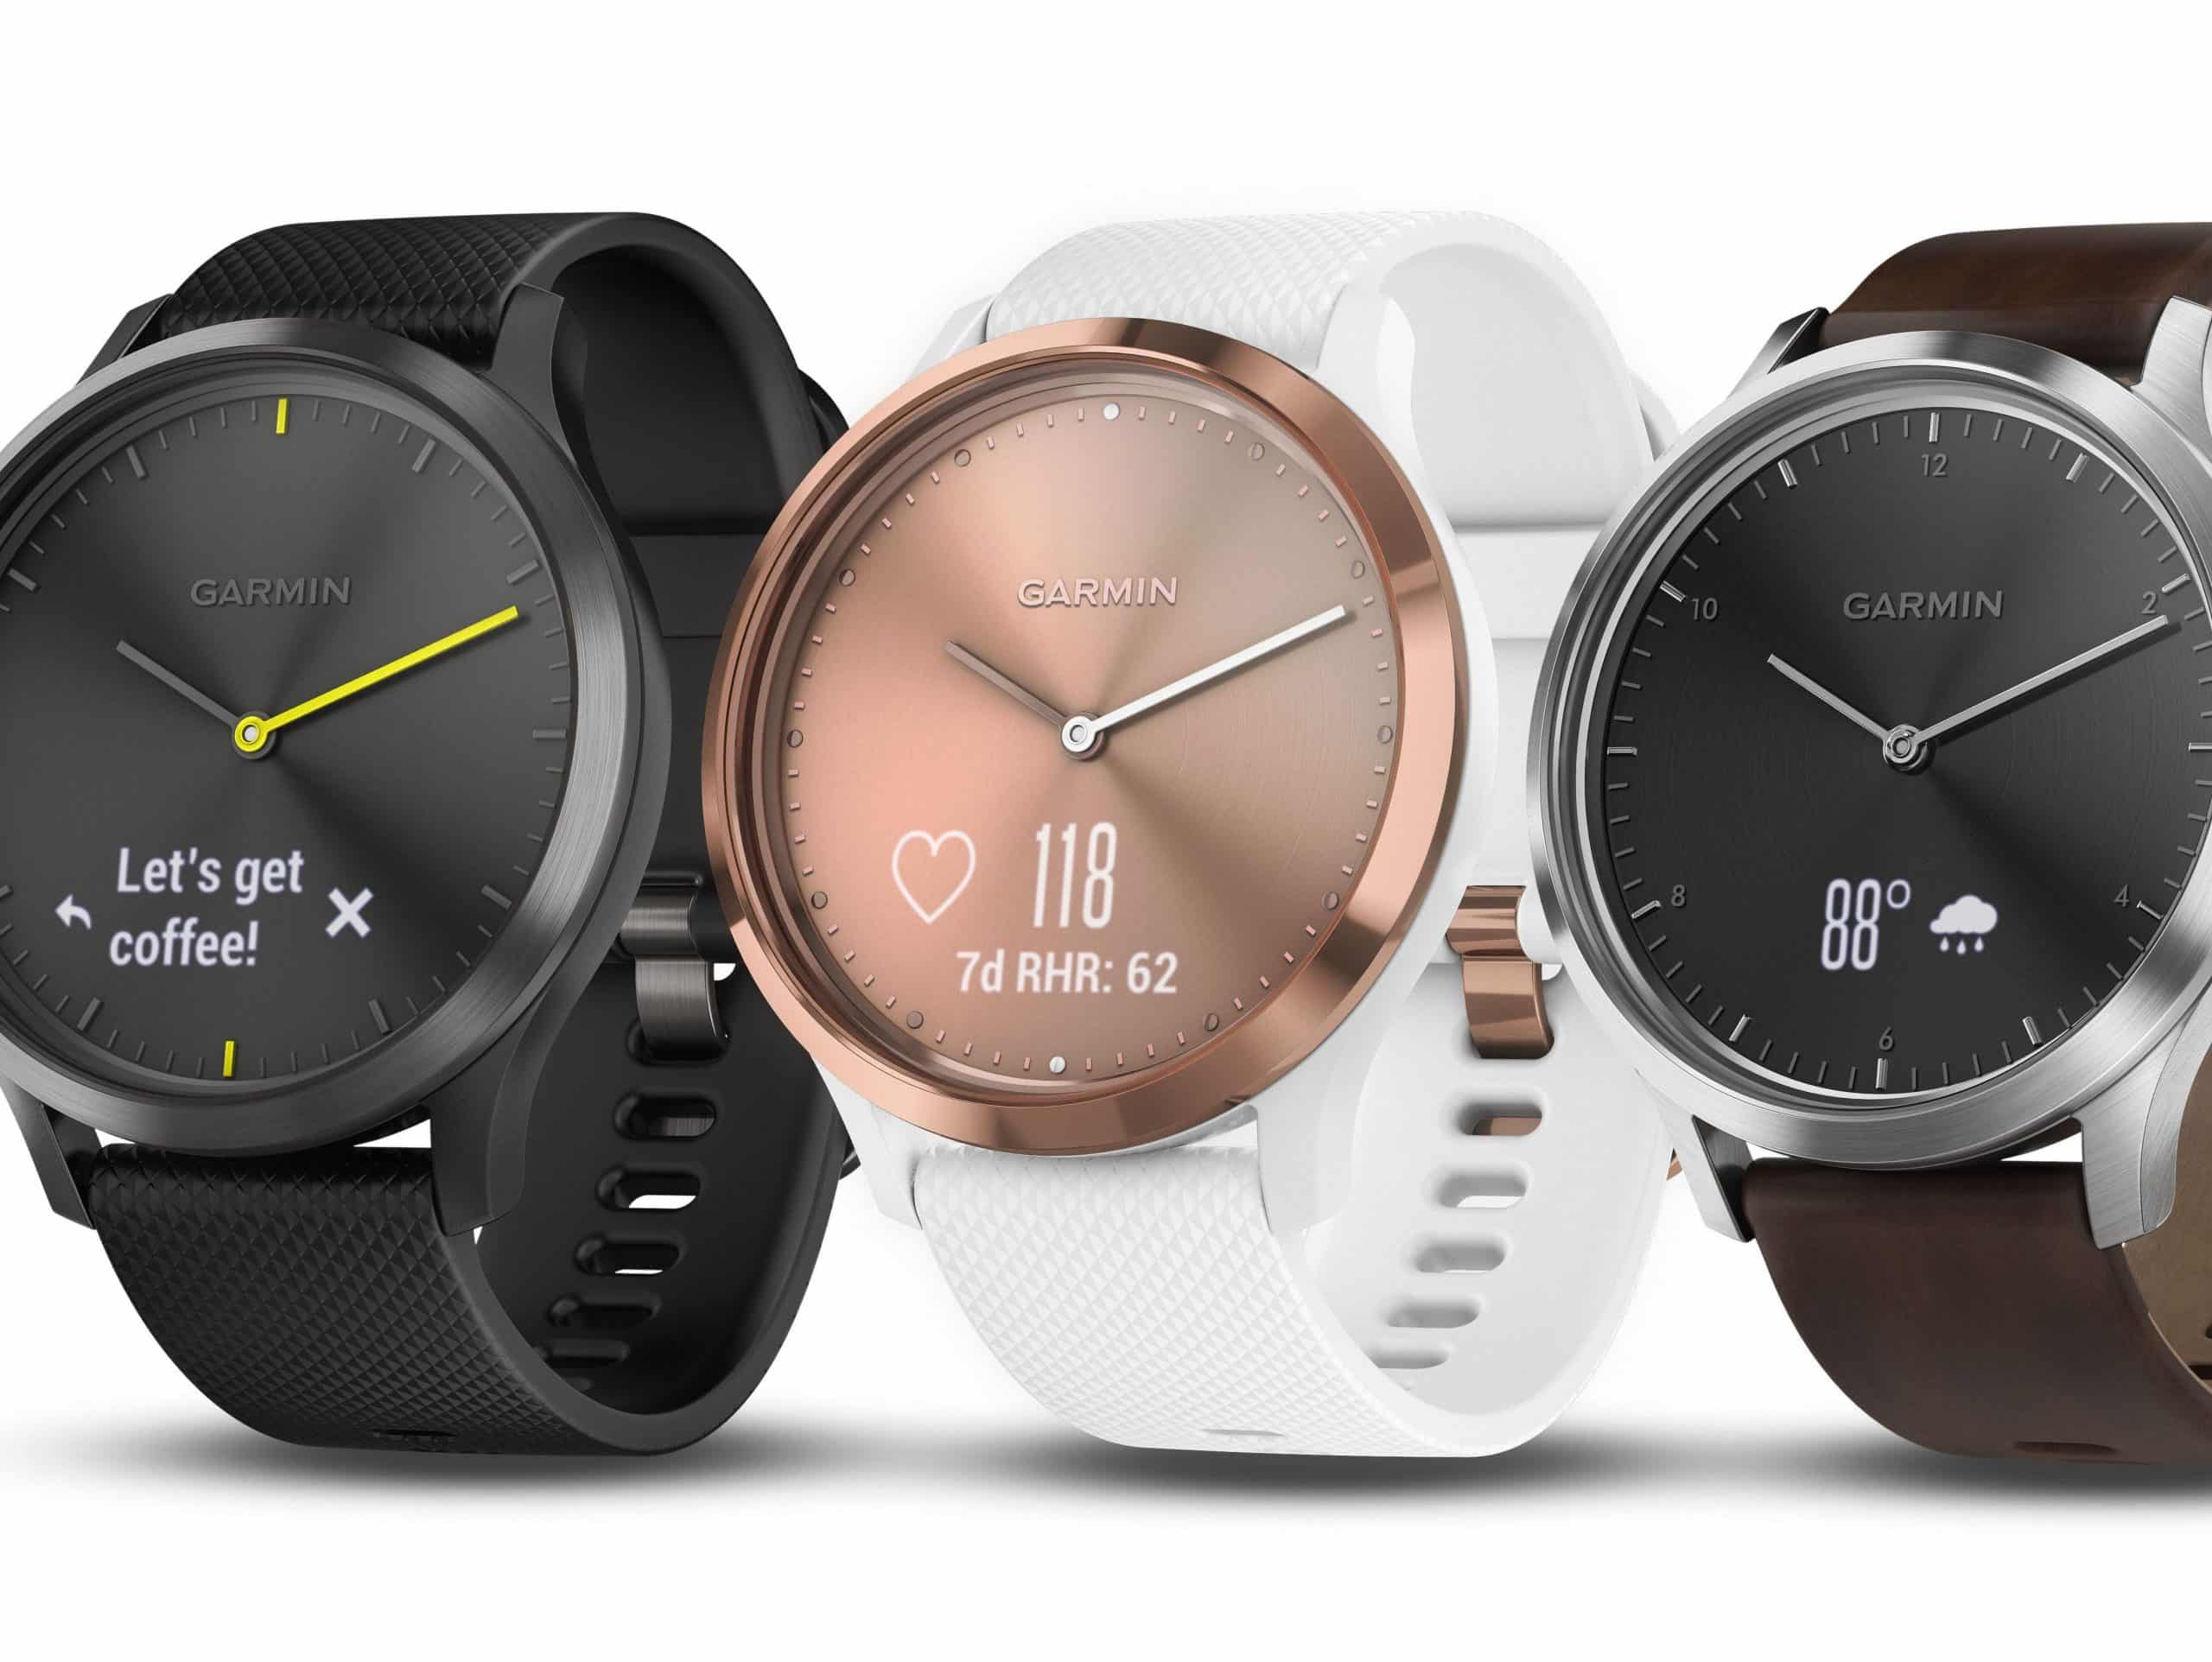 Garmin VivoMove HR Hybrid Smartwatch 1